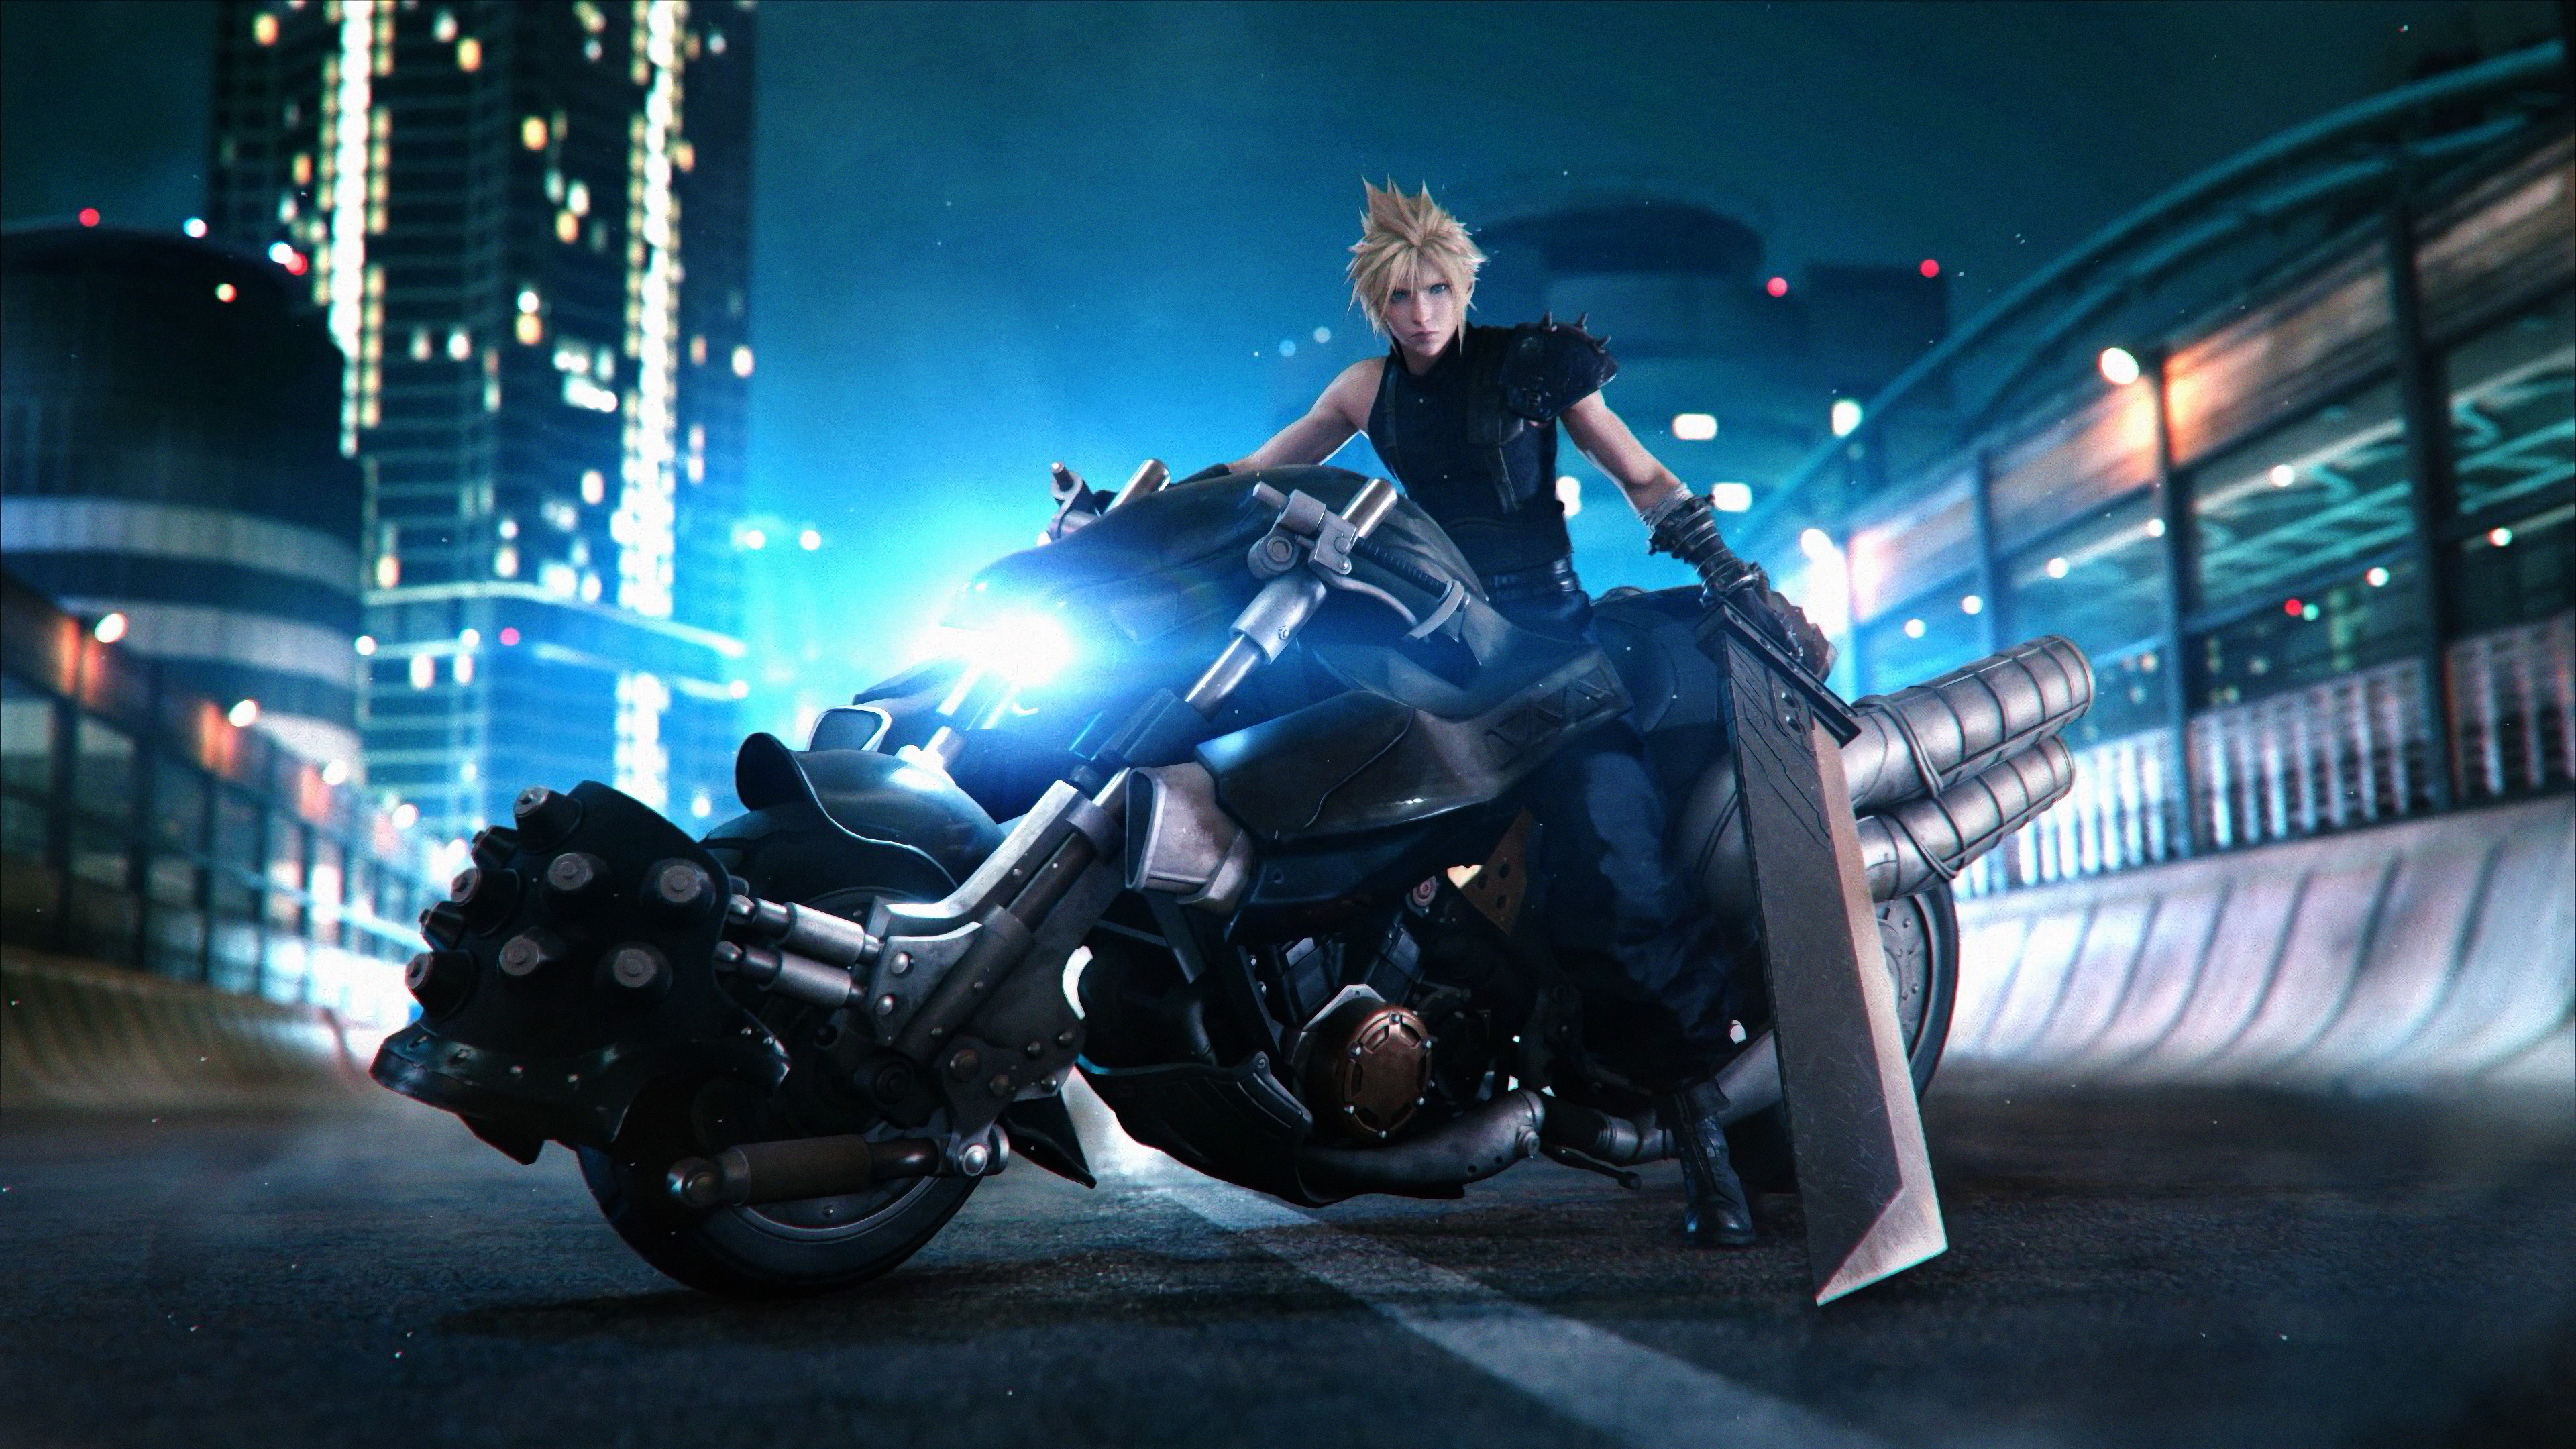 Cloud Strife Motorcycle Final Fantasy 7 Remake 4k Wallpaper 28